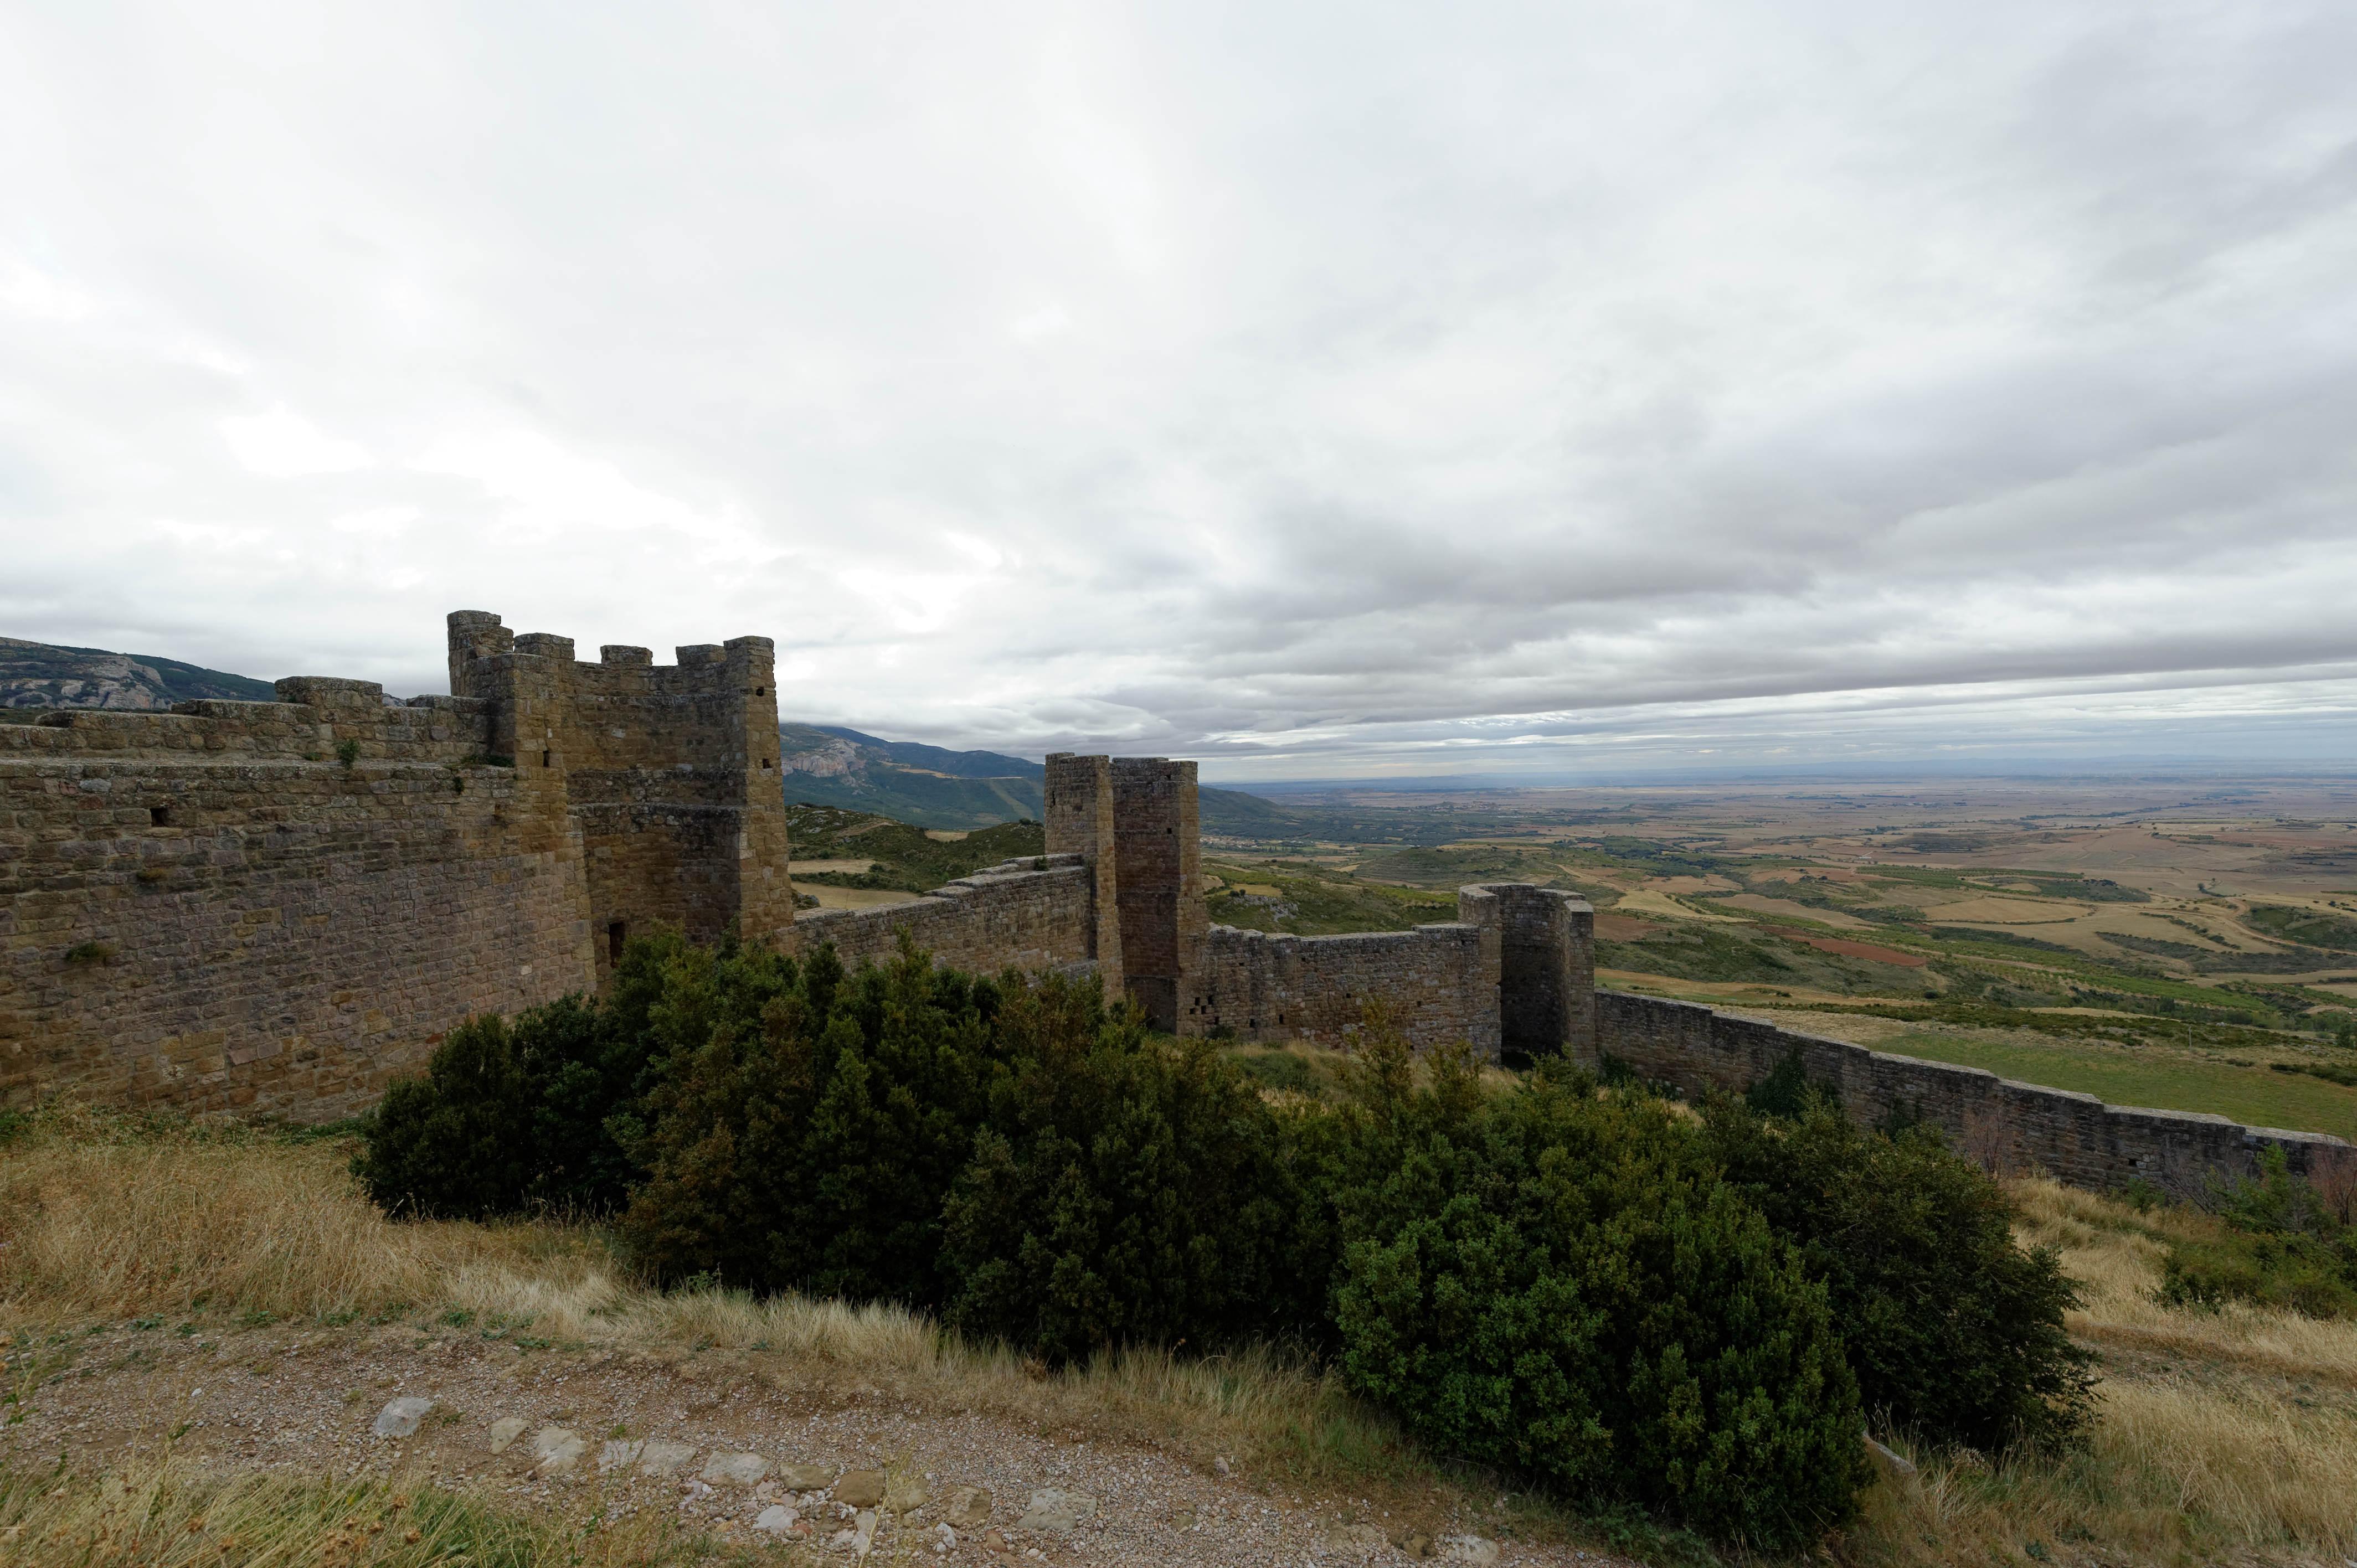 3655_Chateau de Loarre (Aragon)